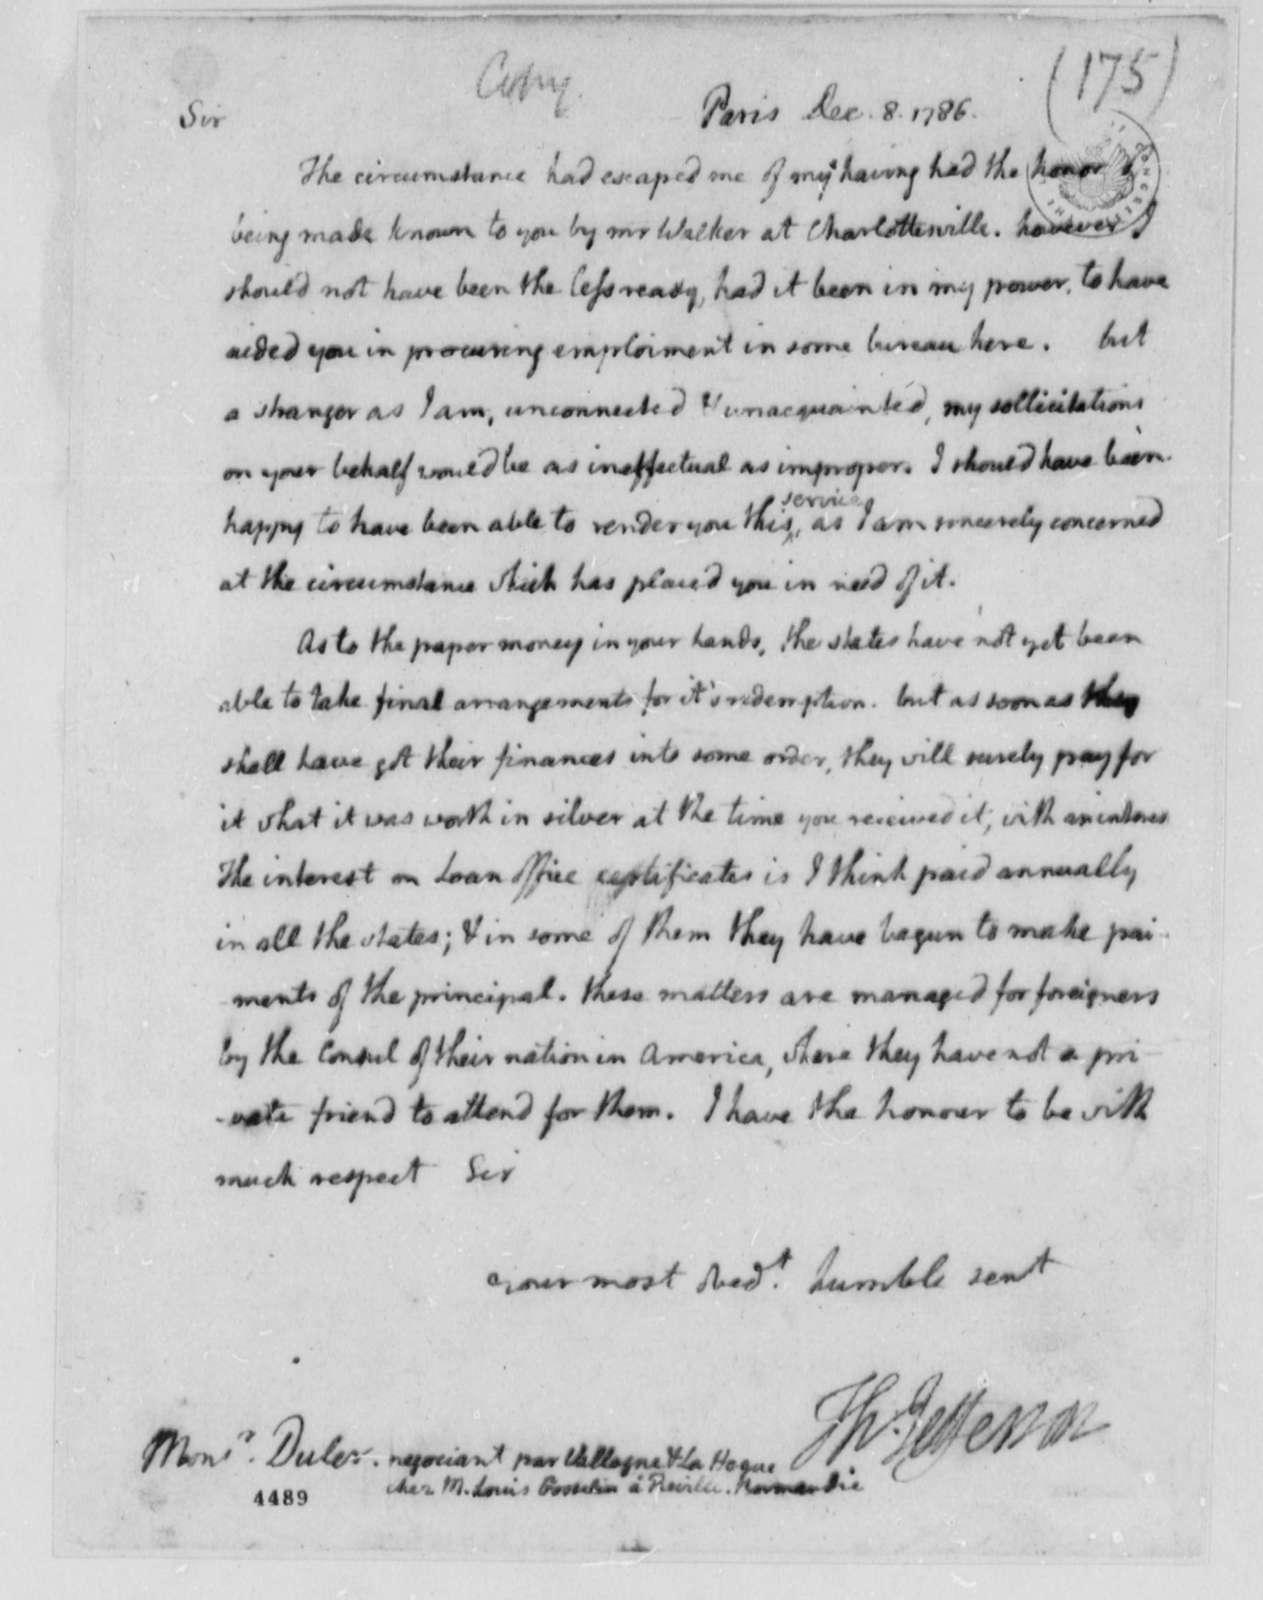 Thomas Jefferson to Duler, December 8, 1786